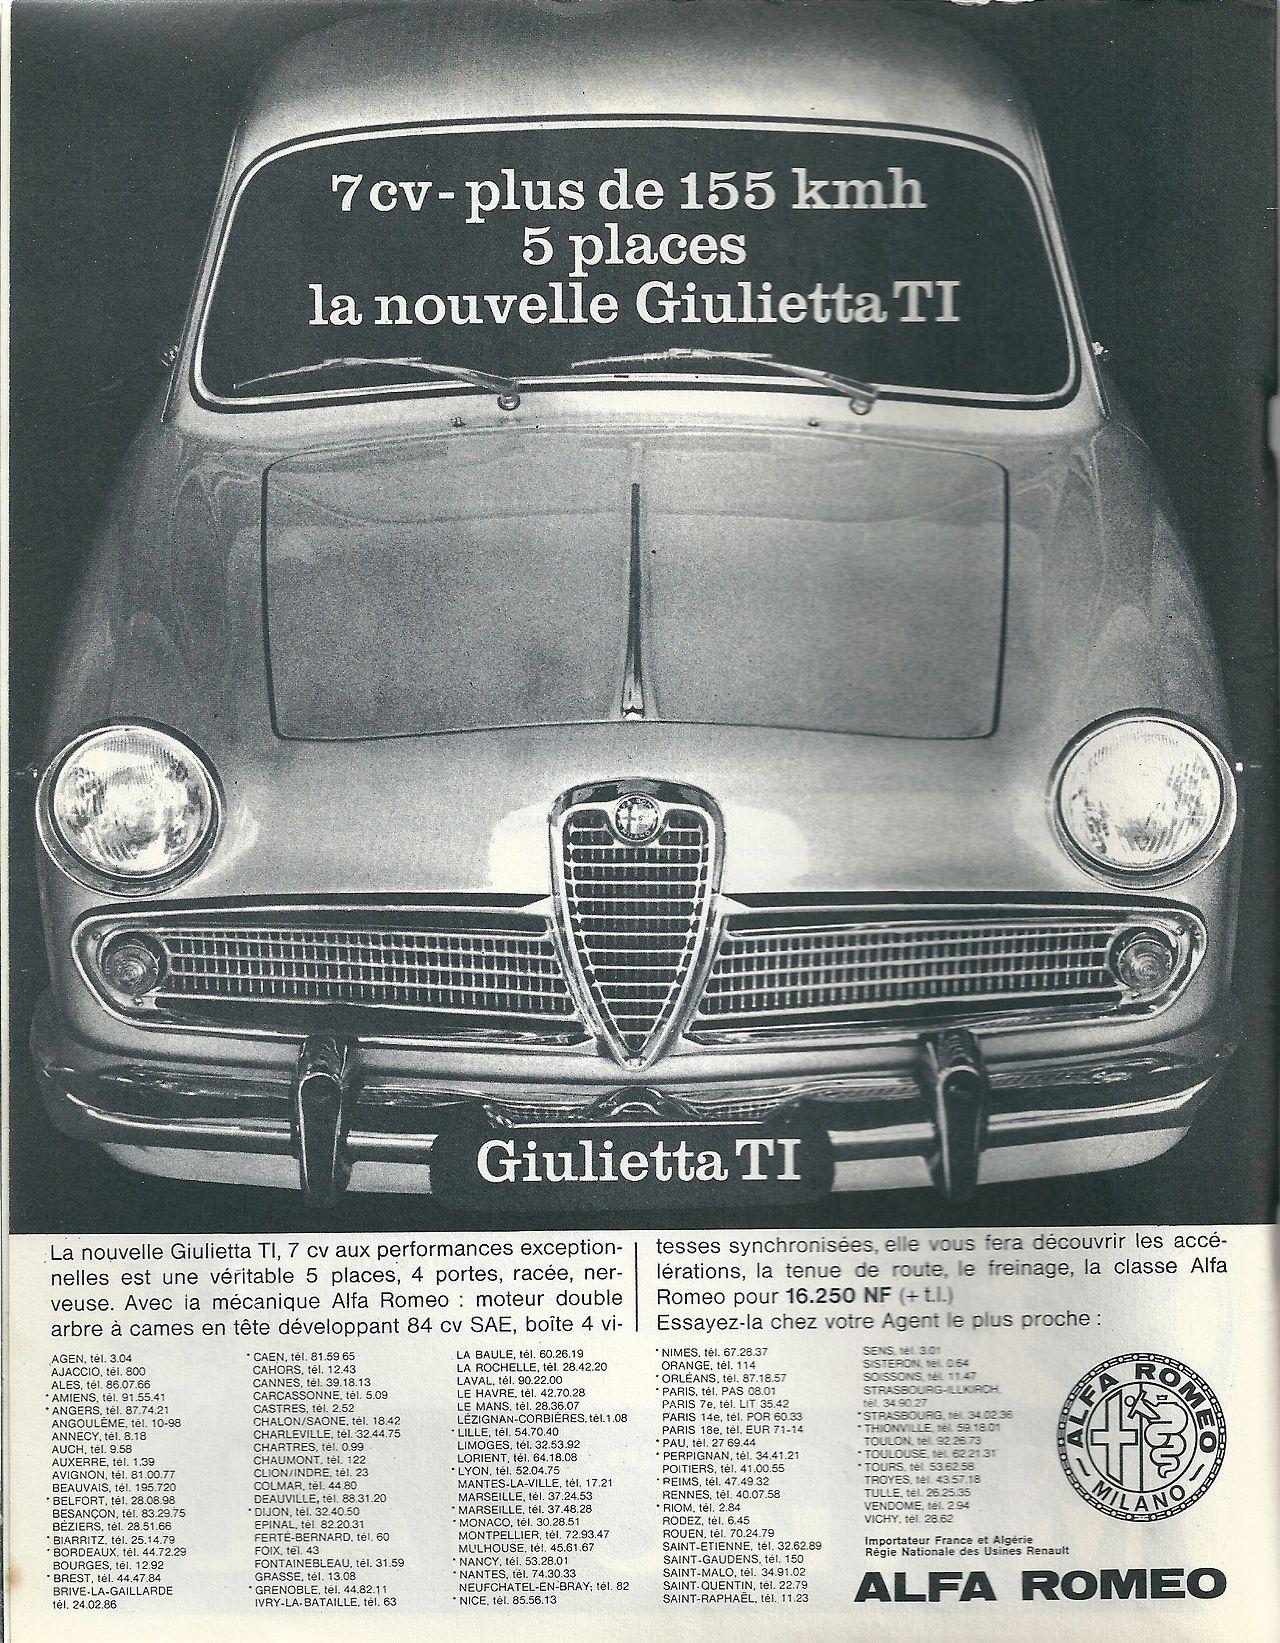 Alfa Romeo Guilietta Ti Publicite Sport Auto N 6 15 Juin 15 Juillet 1962 Automobile Auto Alfa Romeo